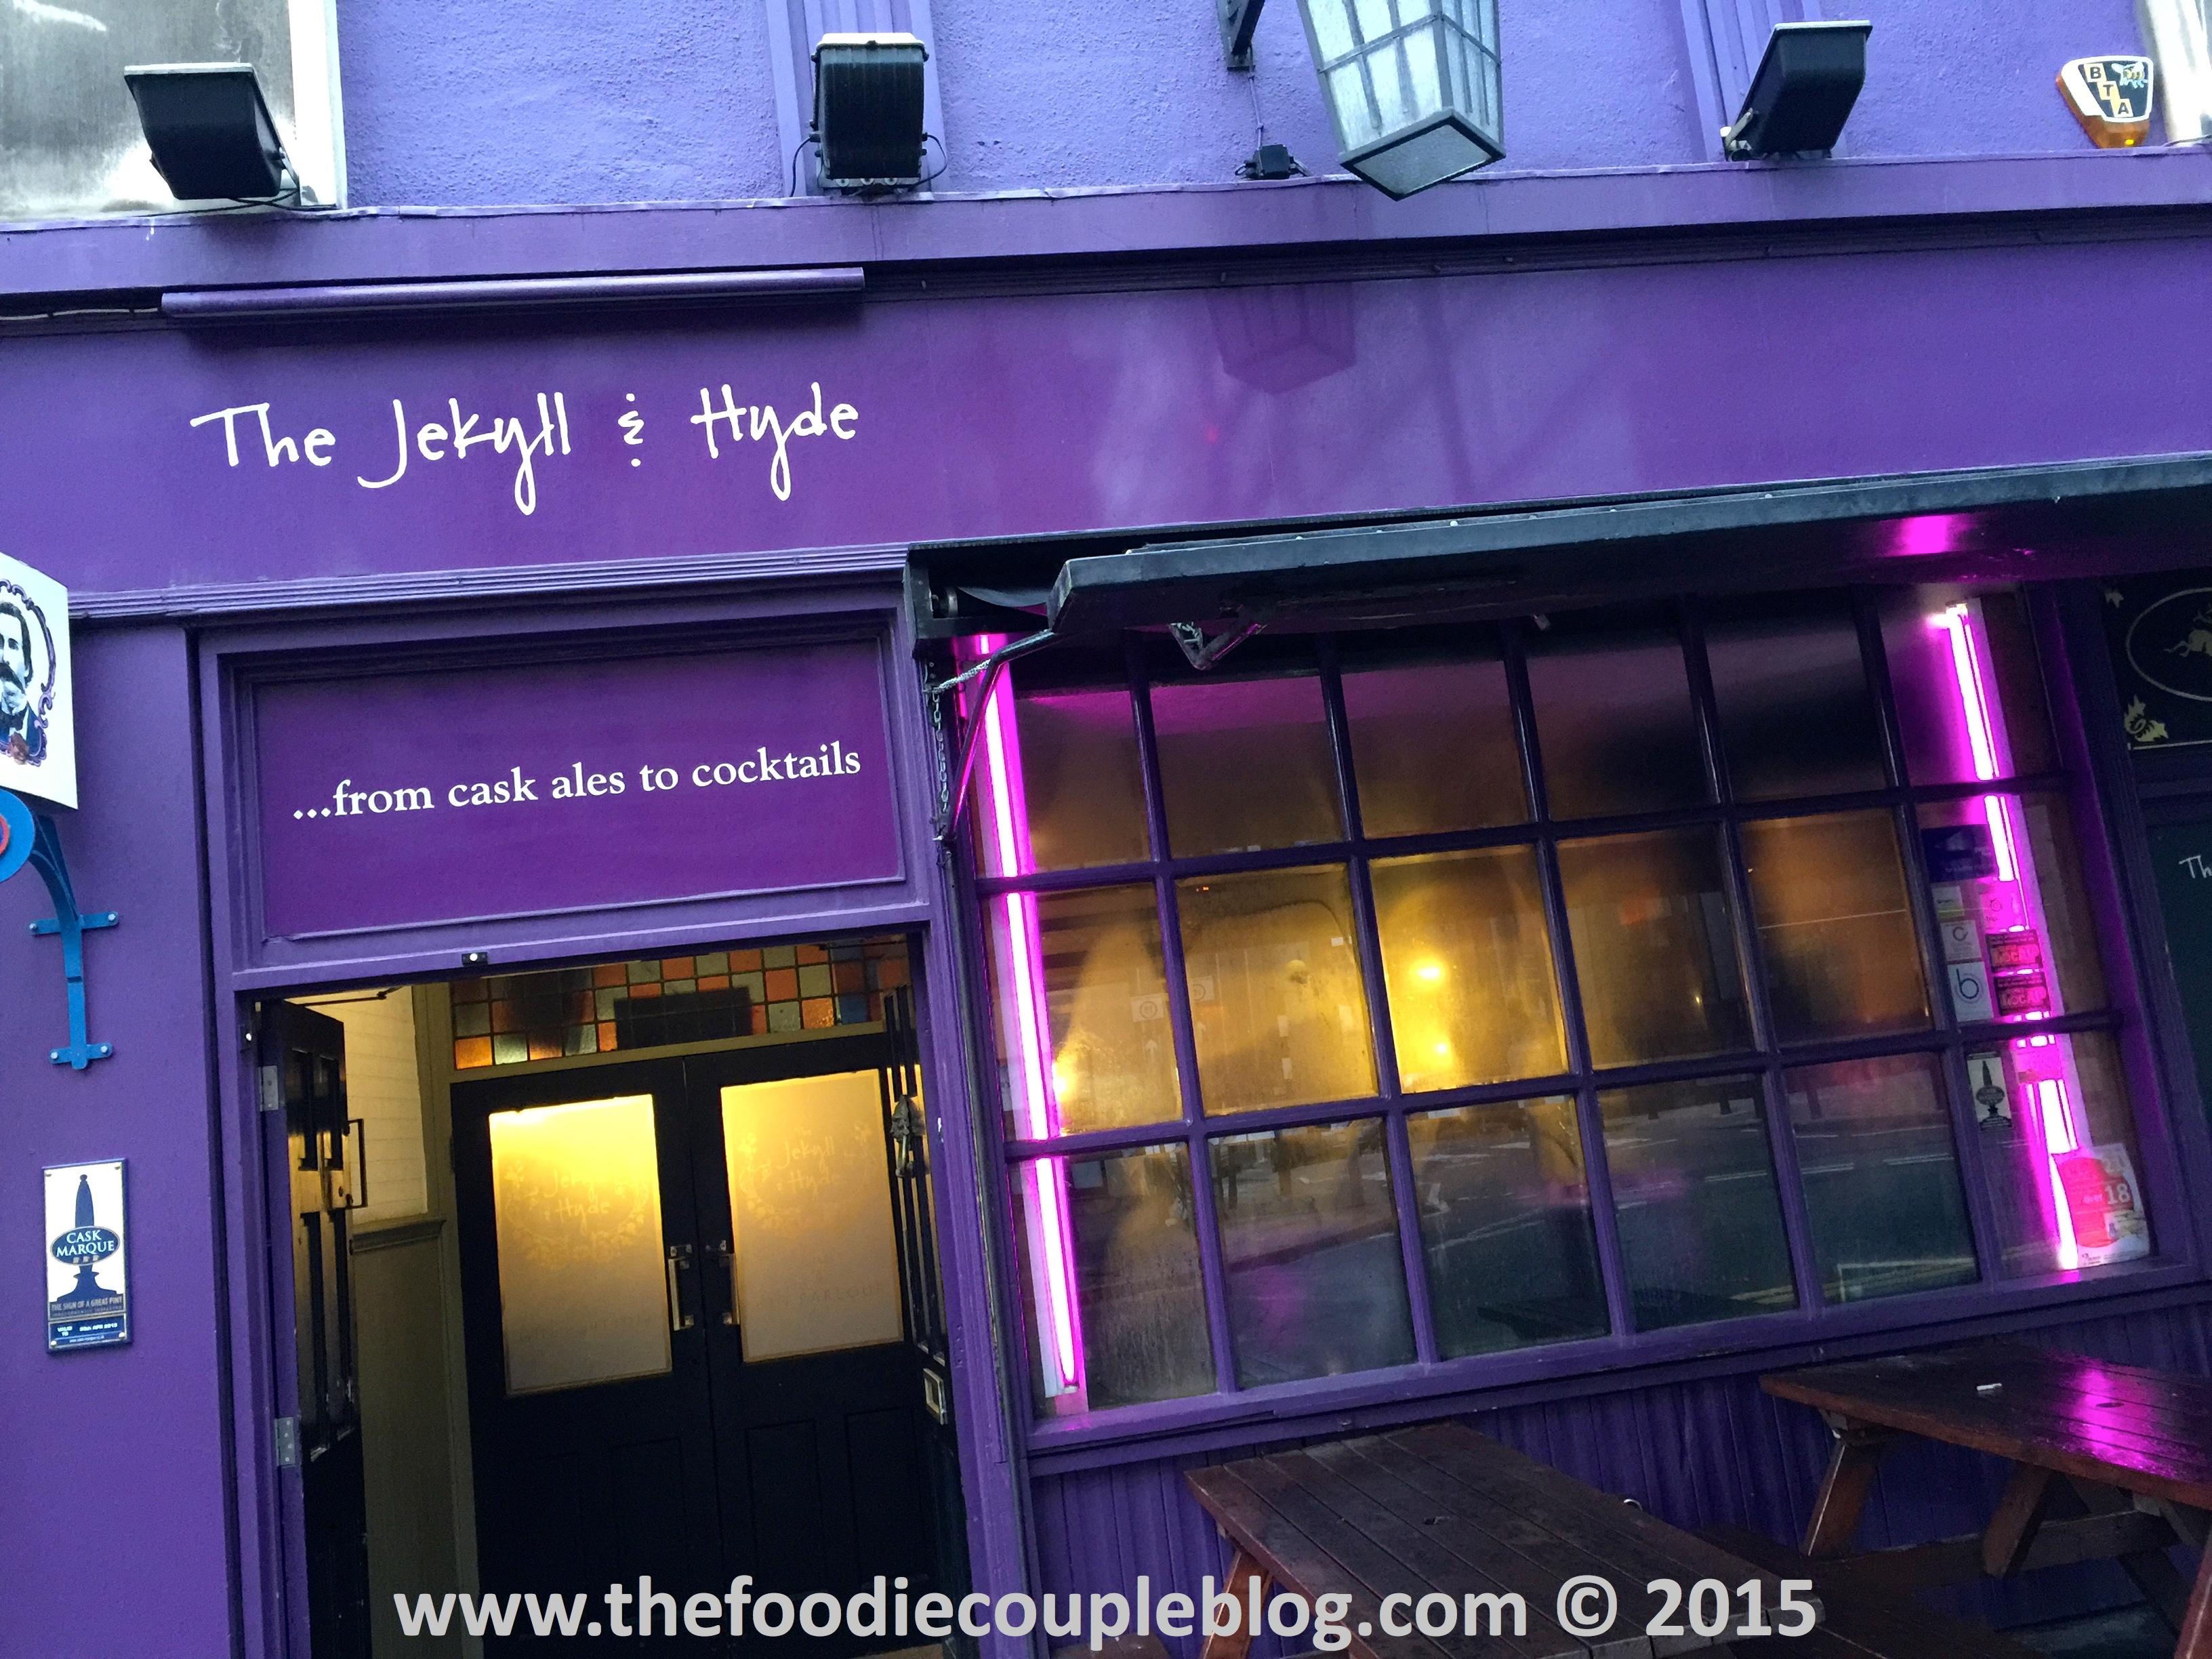 Jekyll and hyde pub birmingham